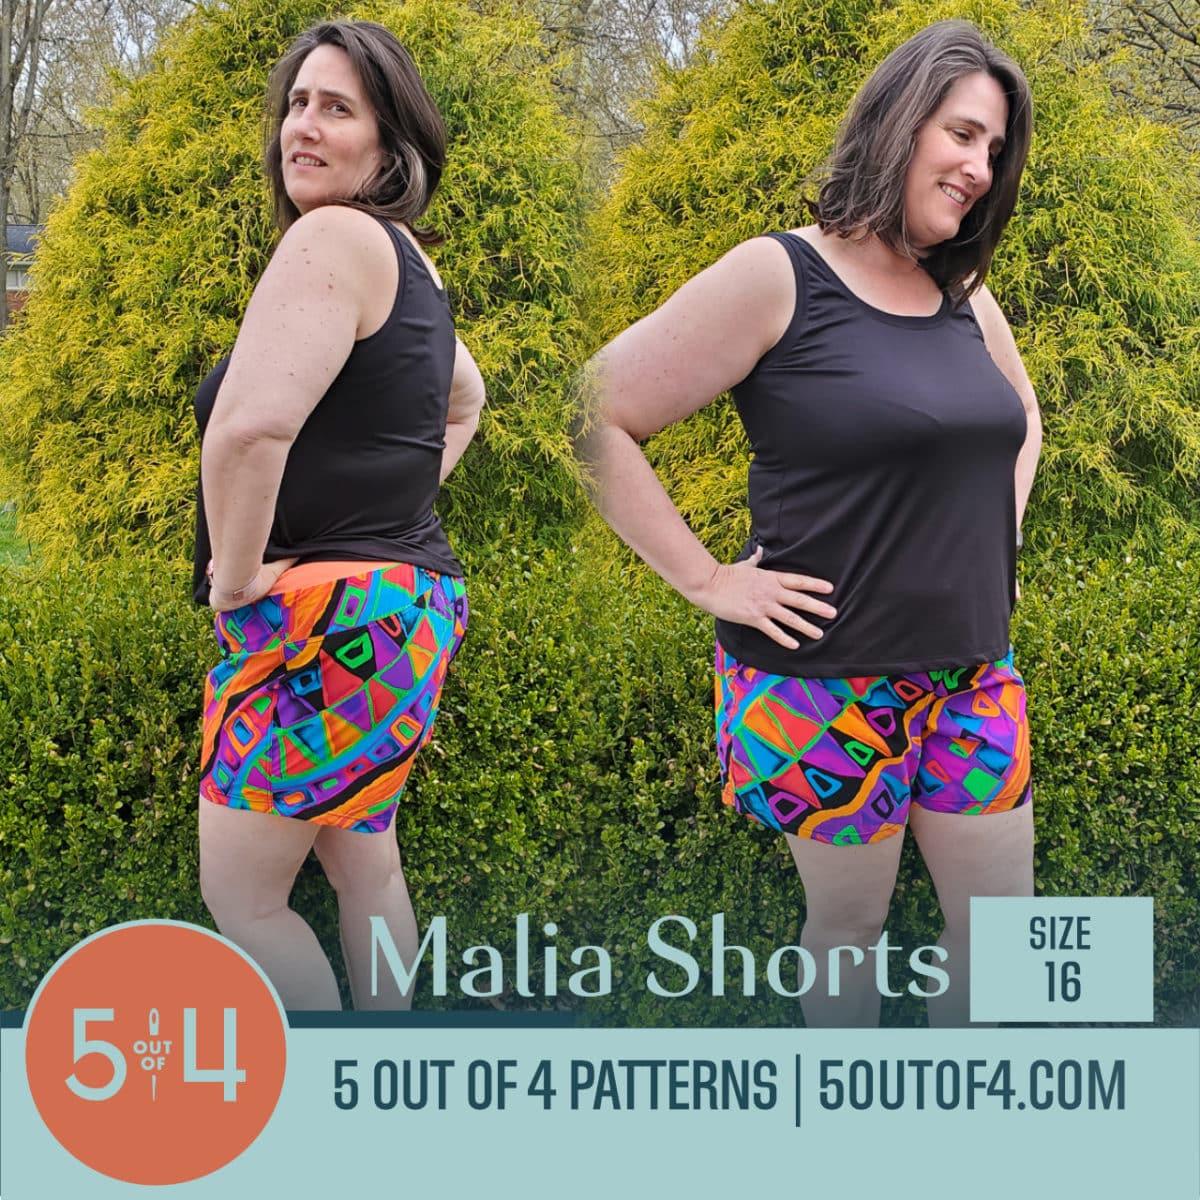 Malia Shorts Size 16 colorful